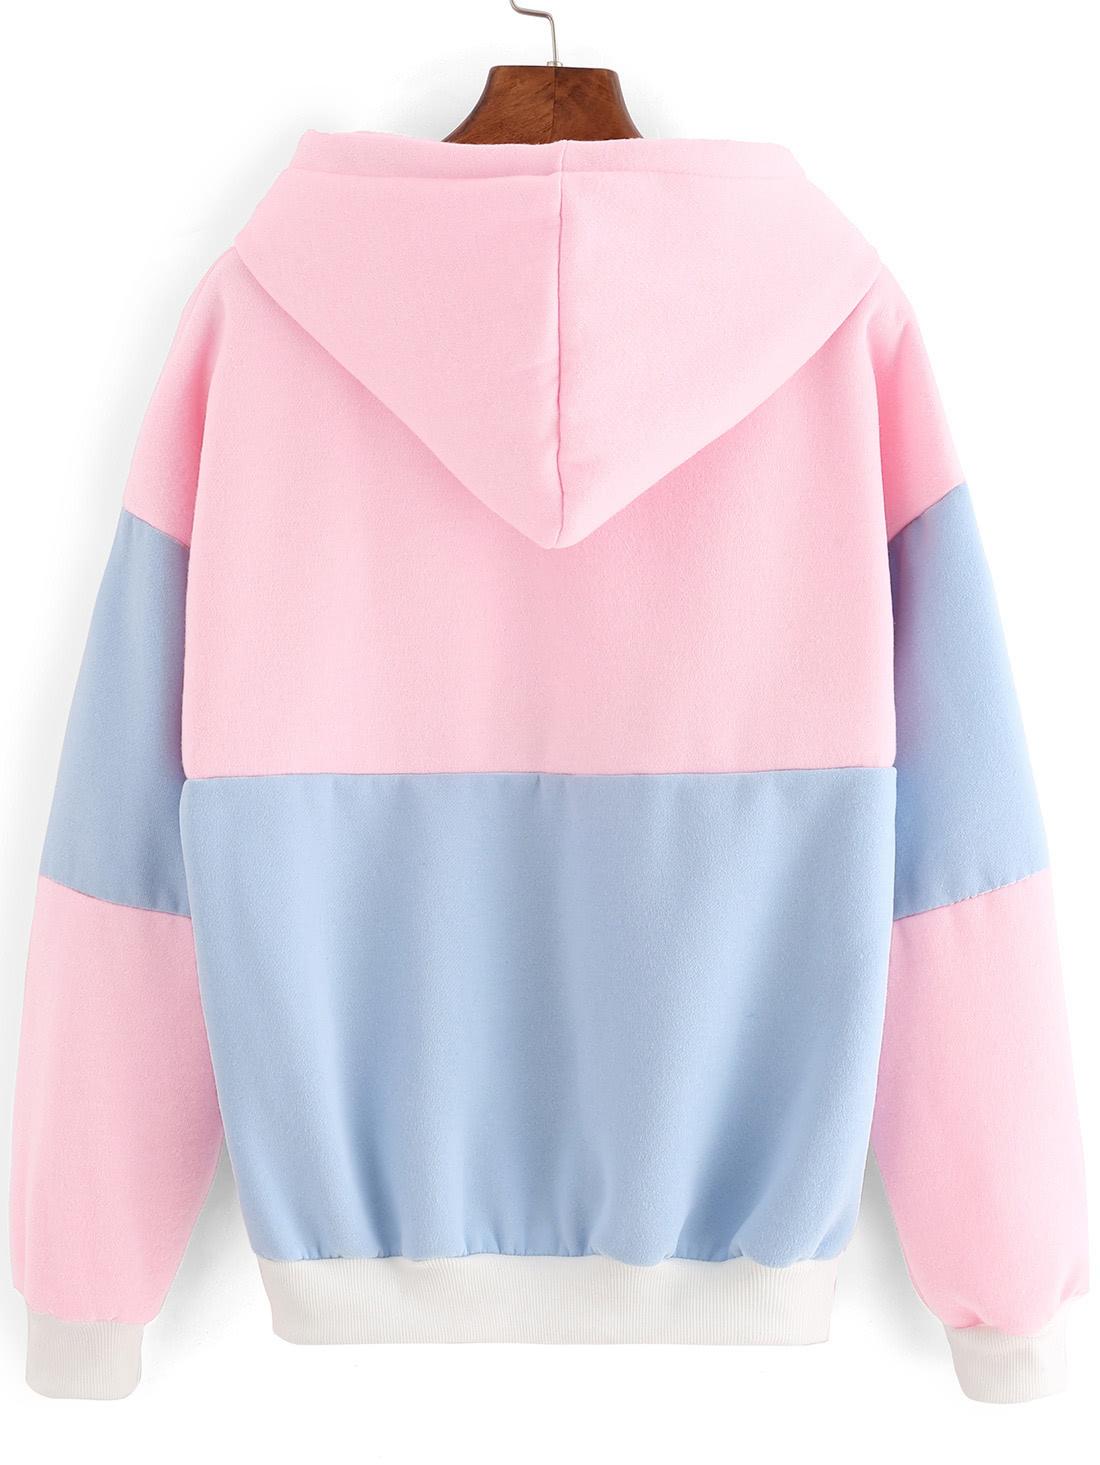 Color Block Drawstring Hooded SweatshirtFor Women-romwe